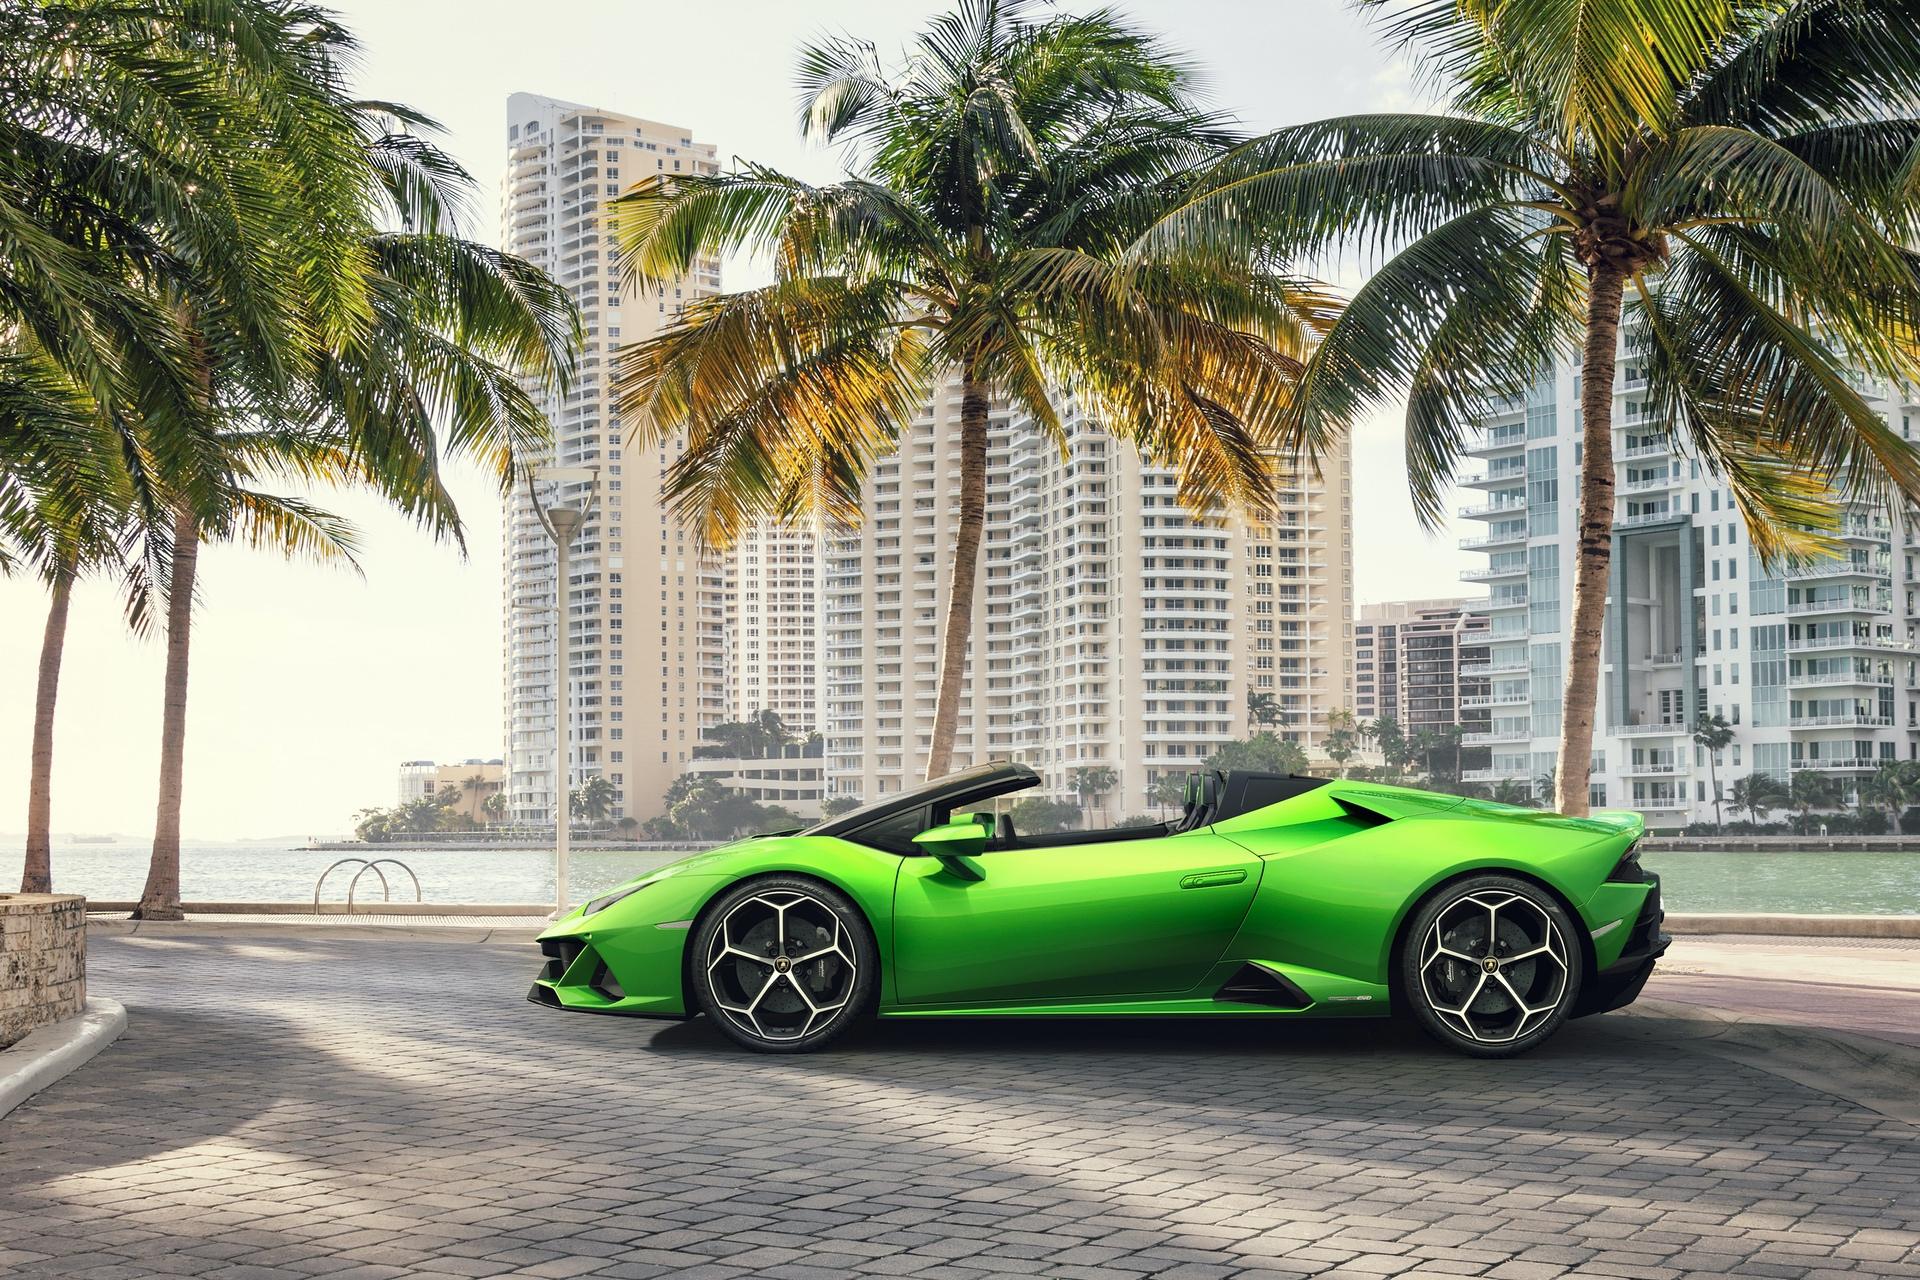 Lamborghini_Huracan_Evo_Spyder_0015